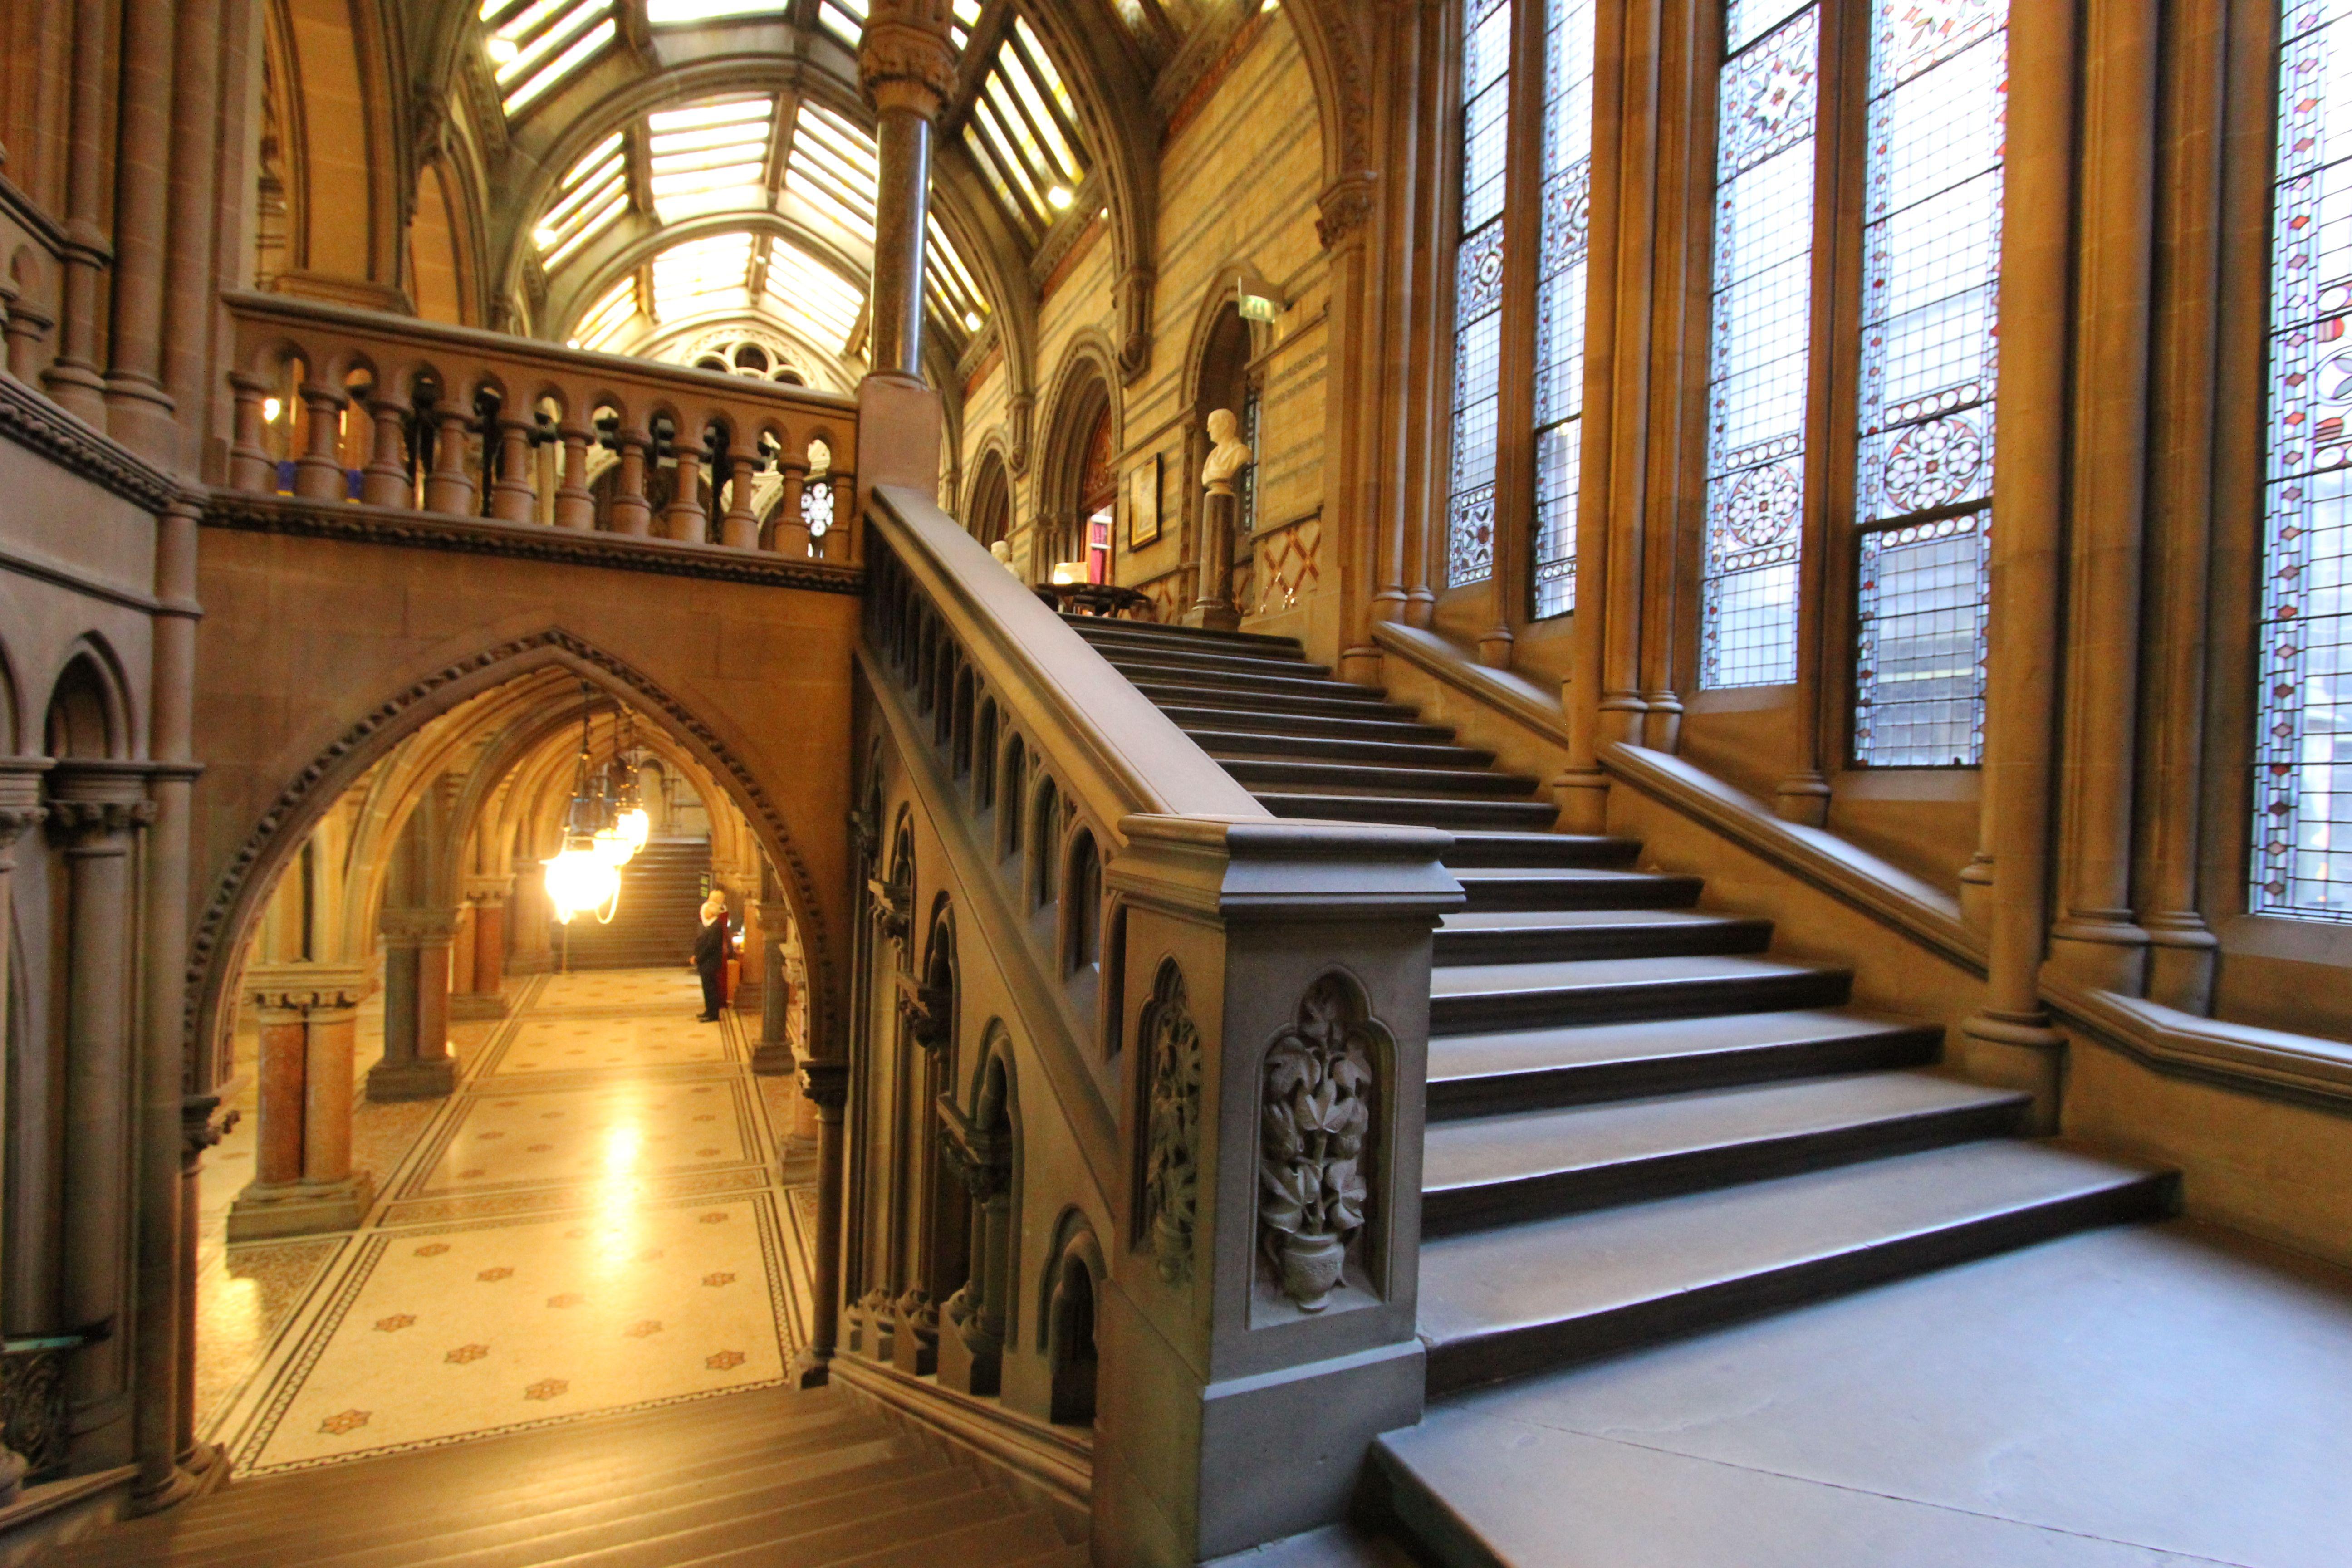 royal castle hallway - Google Search | ARCHITECTURE ...